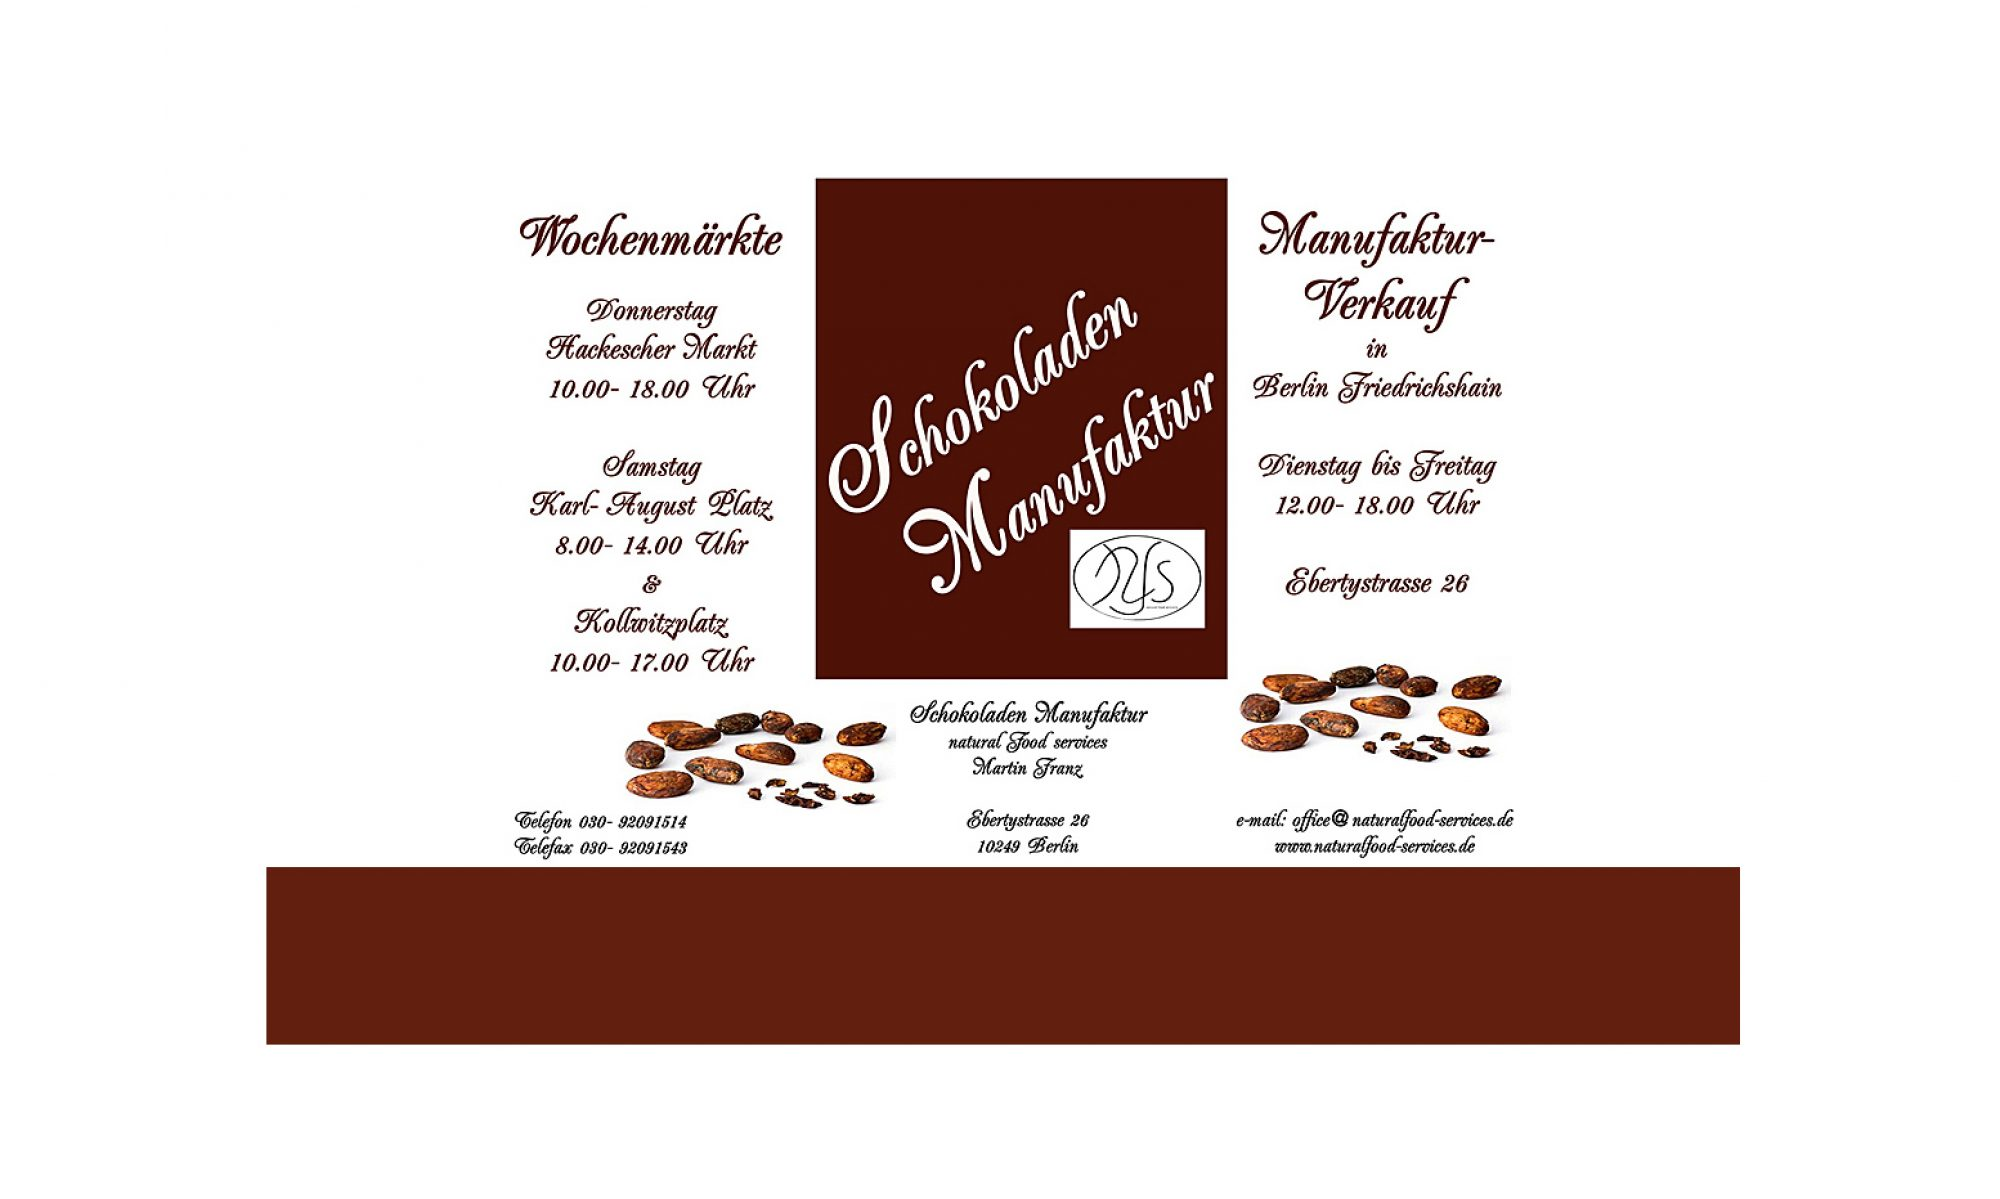 Schokoladen Manufaktur